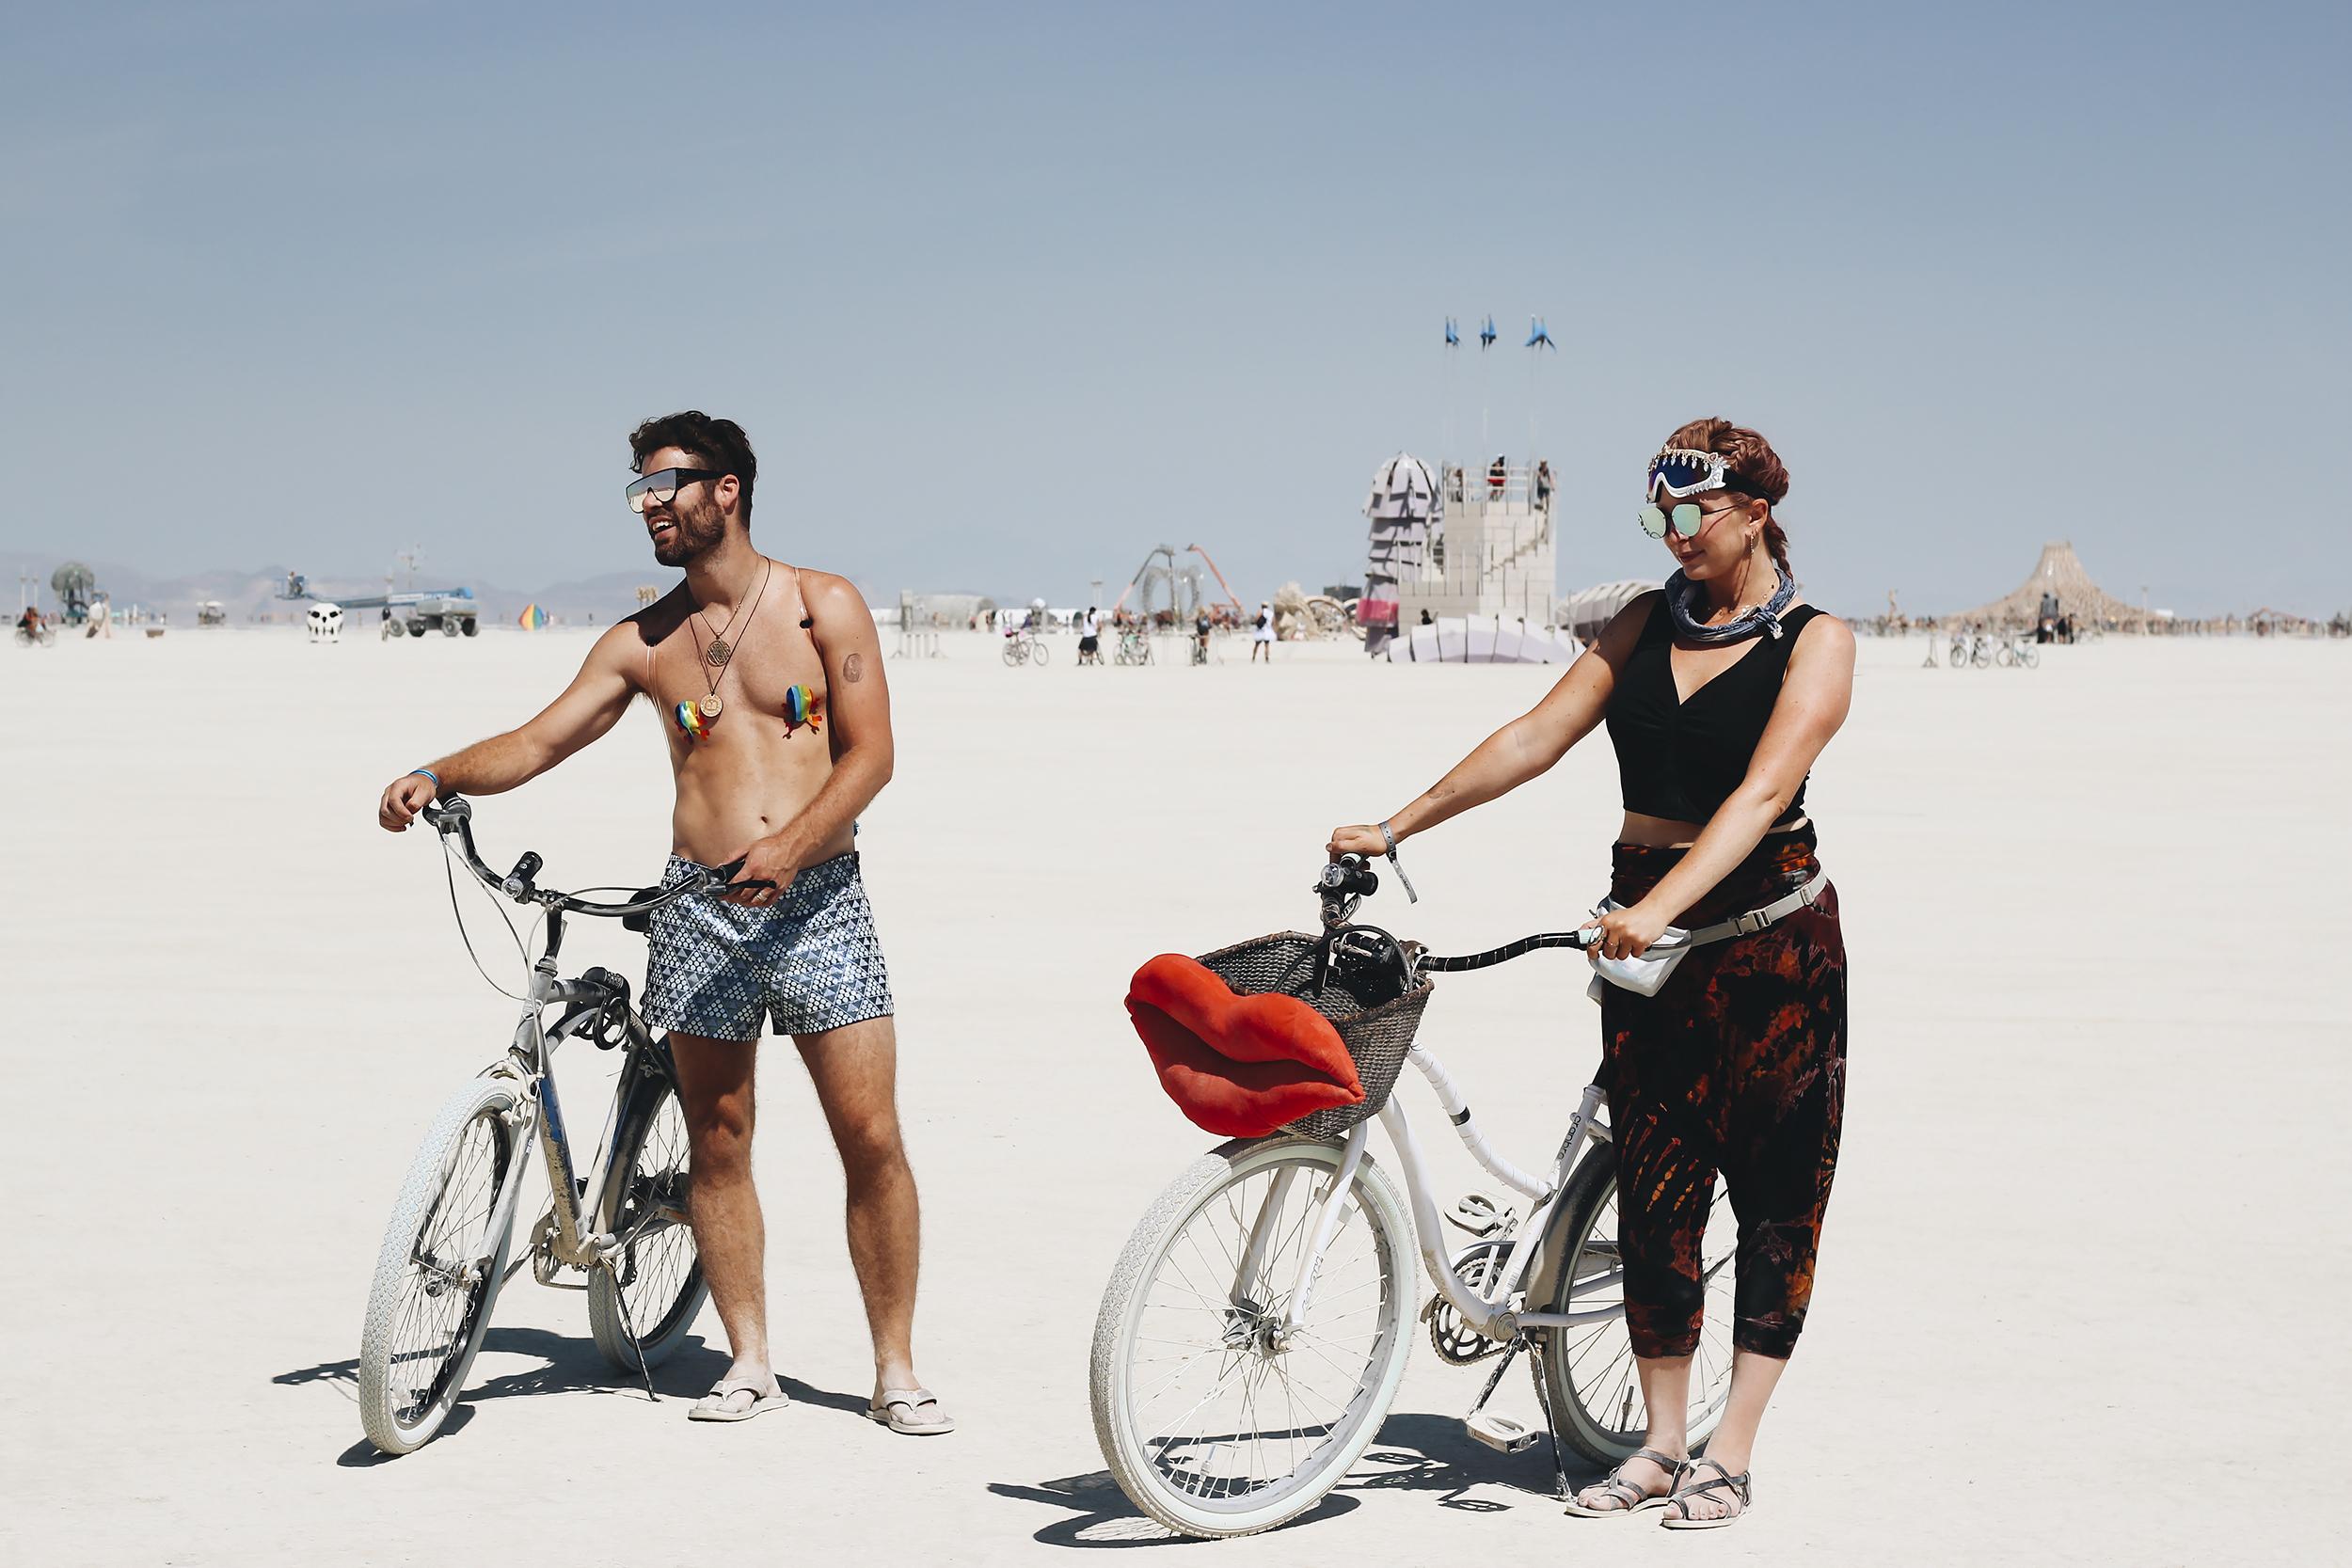 We biked around to look at art.